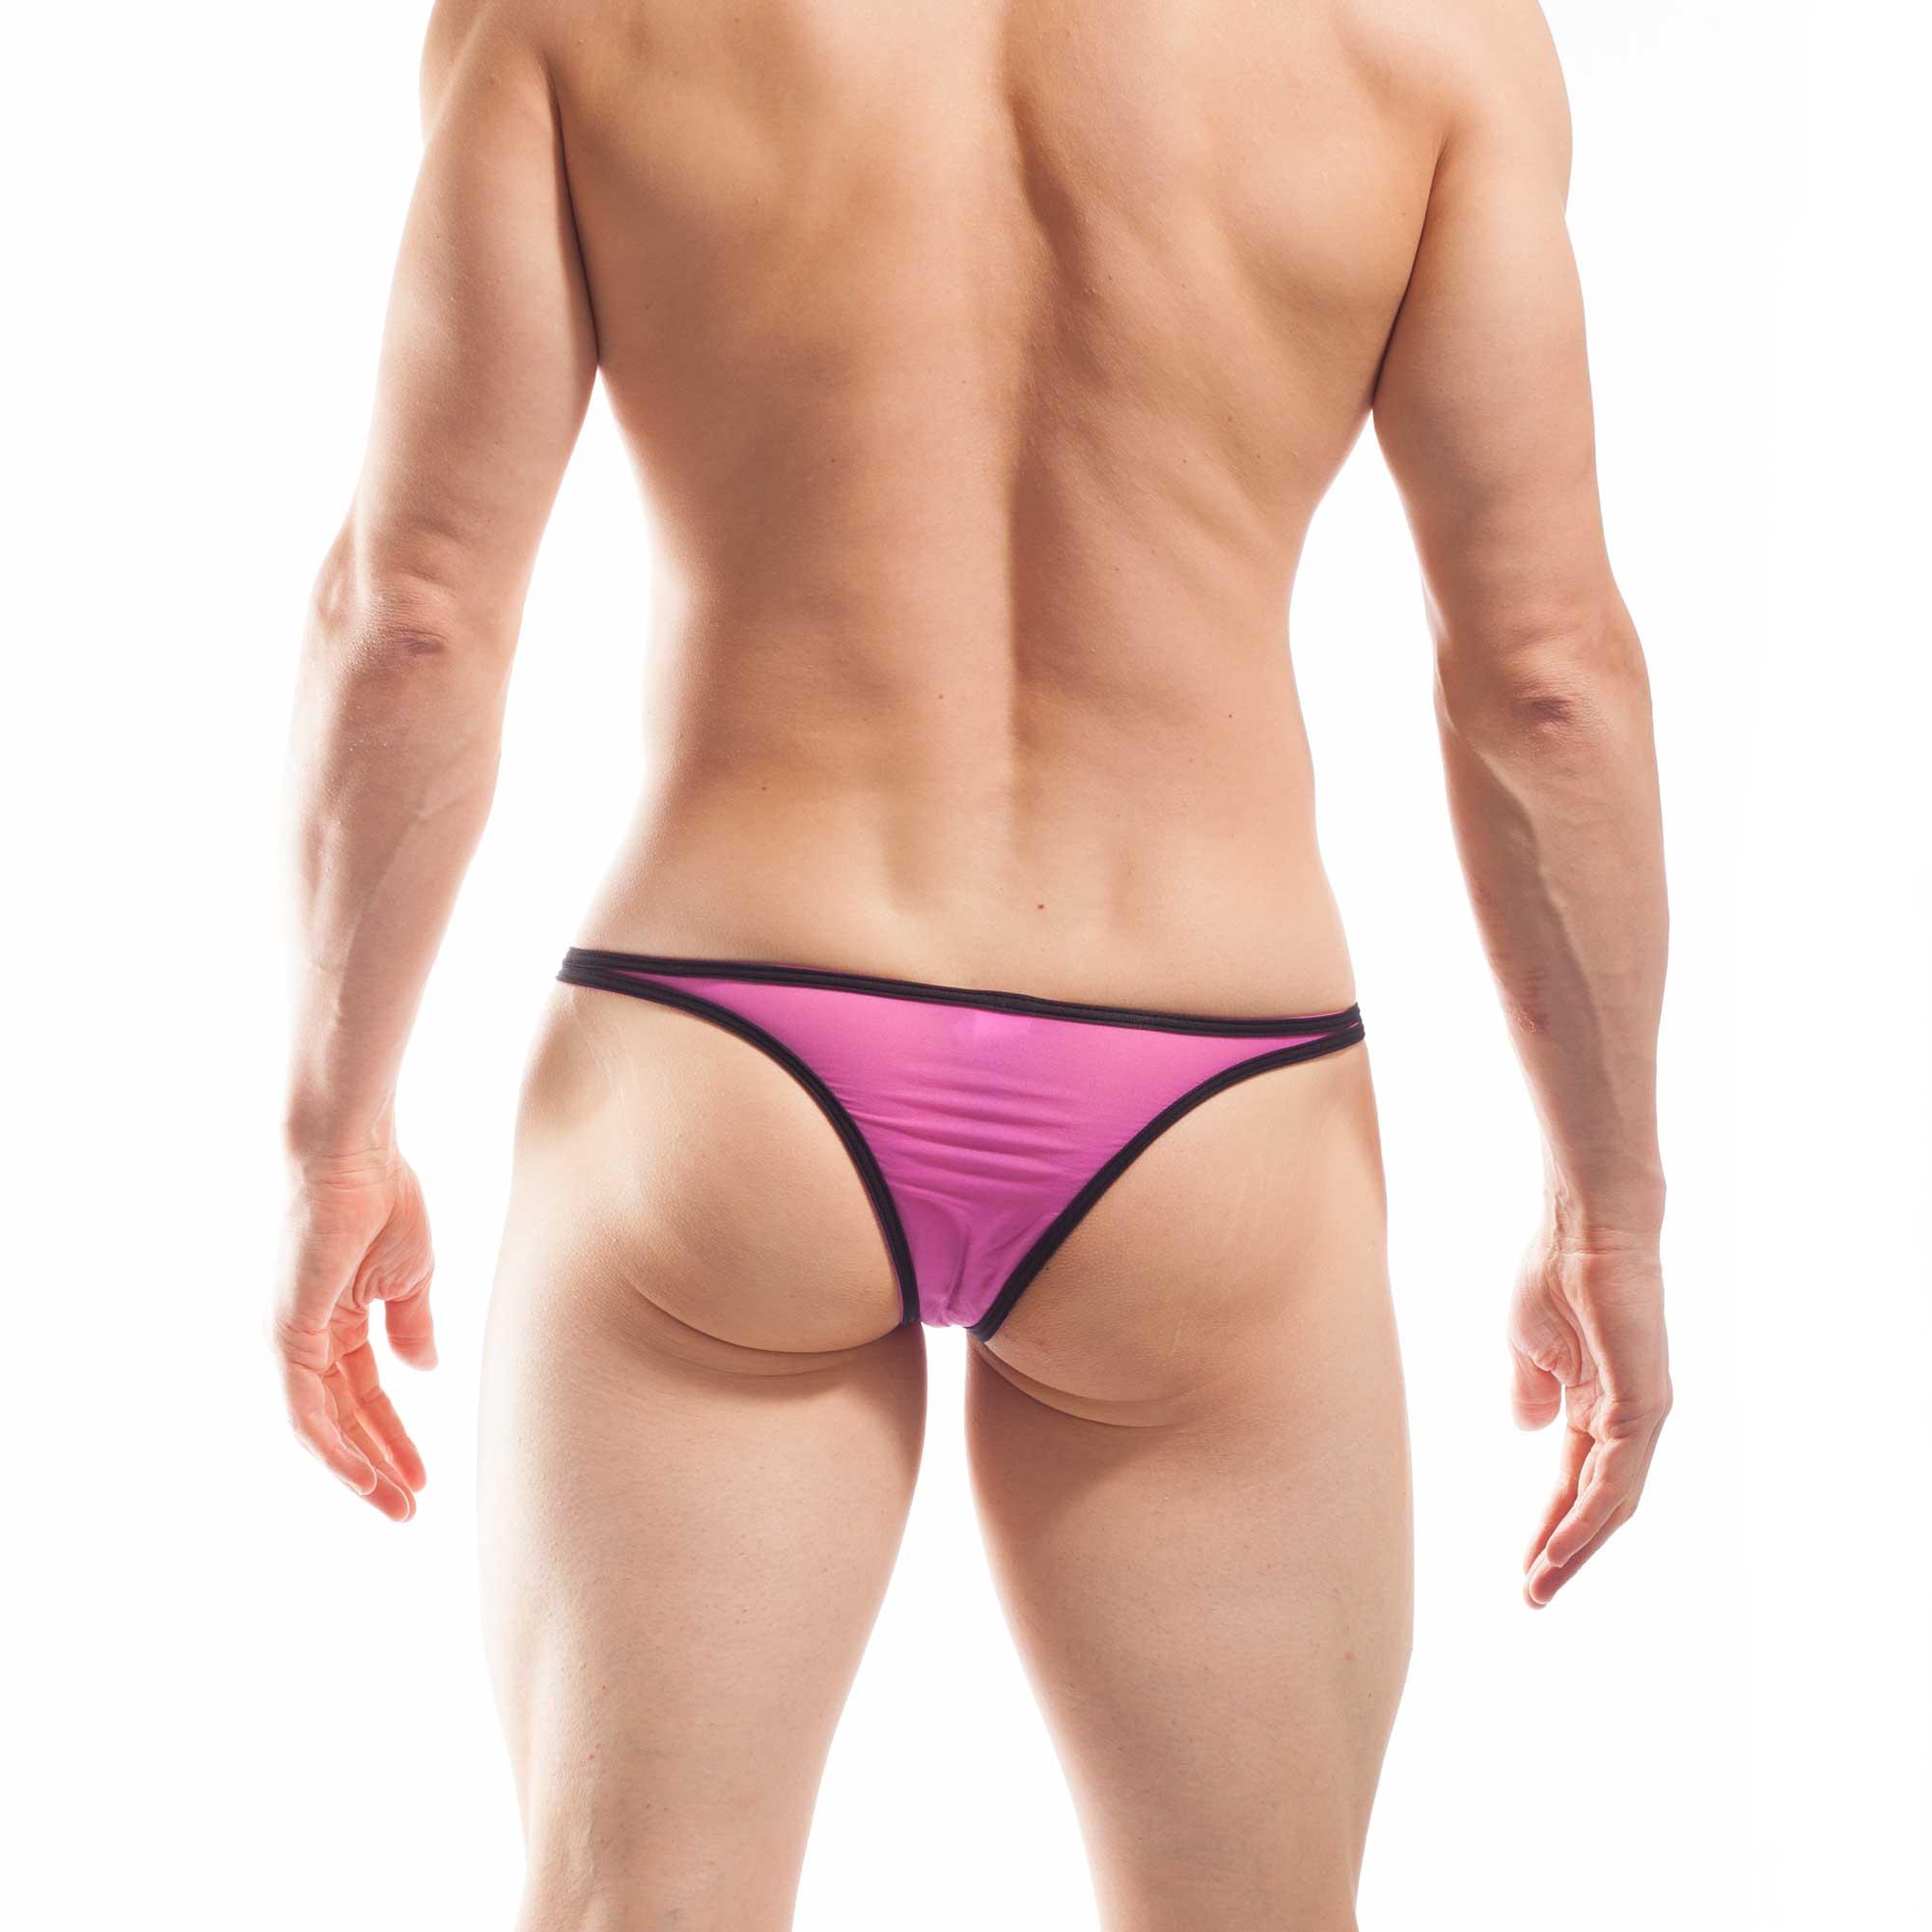 BEUN STRIPE PUSH UP MINI TANGA, Tanga, brasil, knappe Badehose, swim trunks, kontrast Ränder, schwarze Börtchen, candy pink, feilchen lila